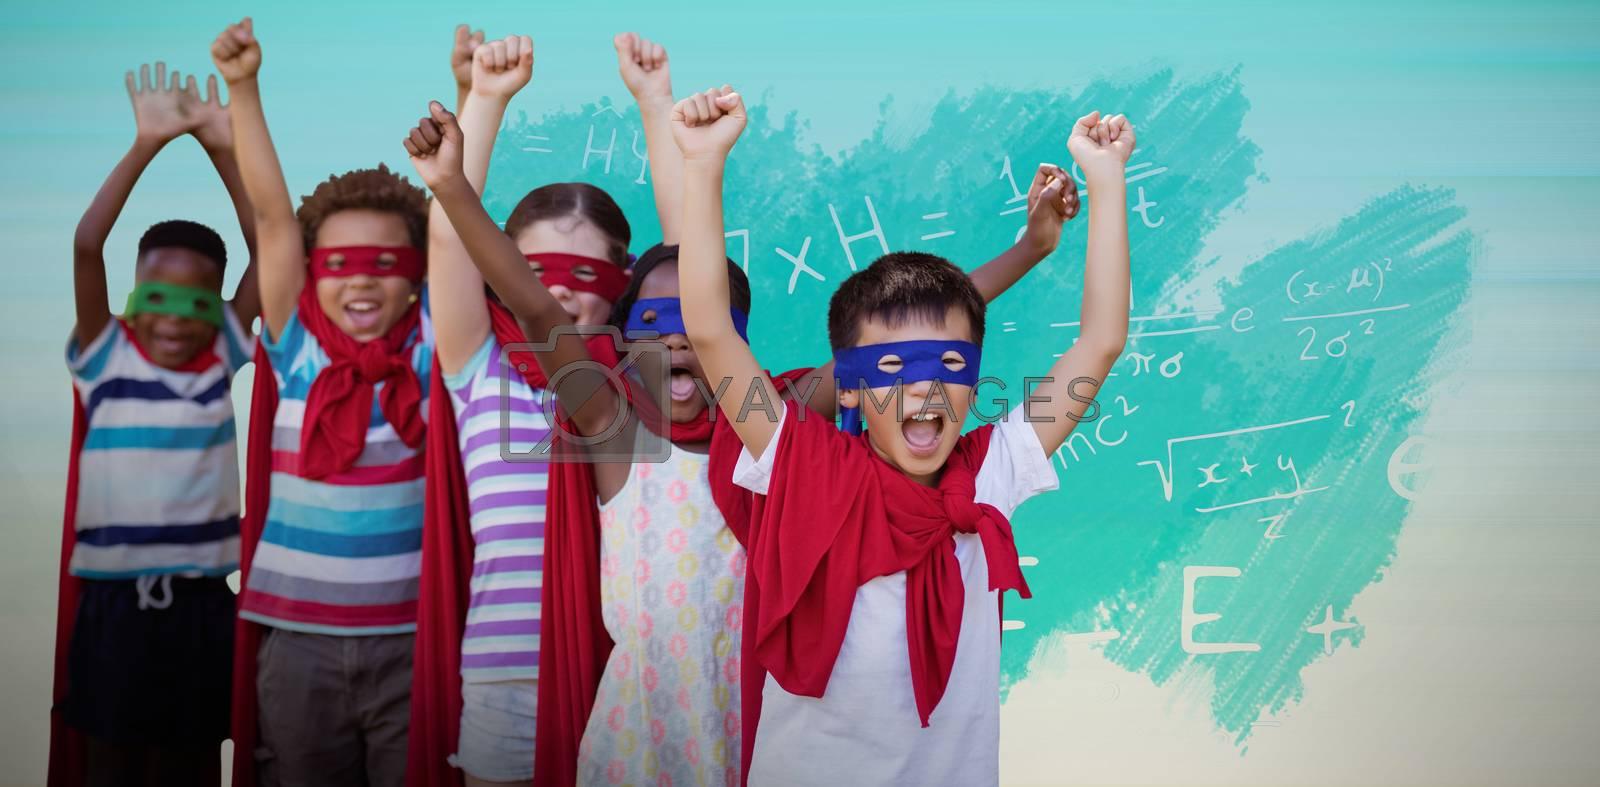 Composite image of children in superhero costumes by Wavebreakmedia